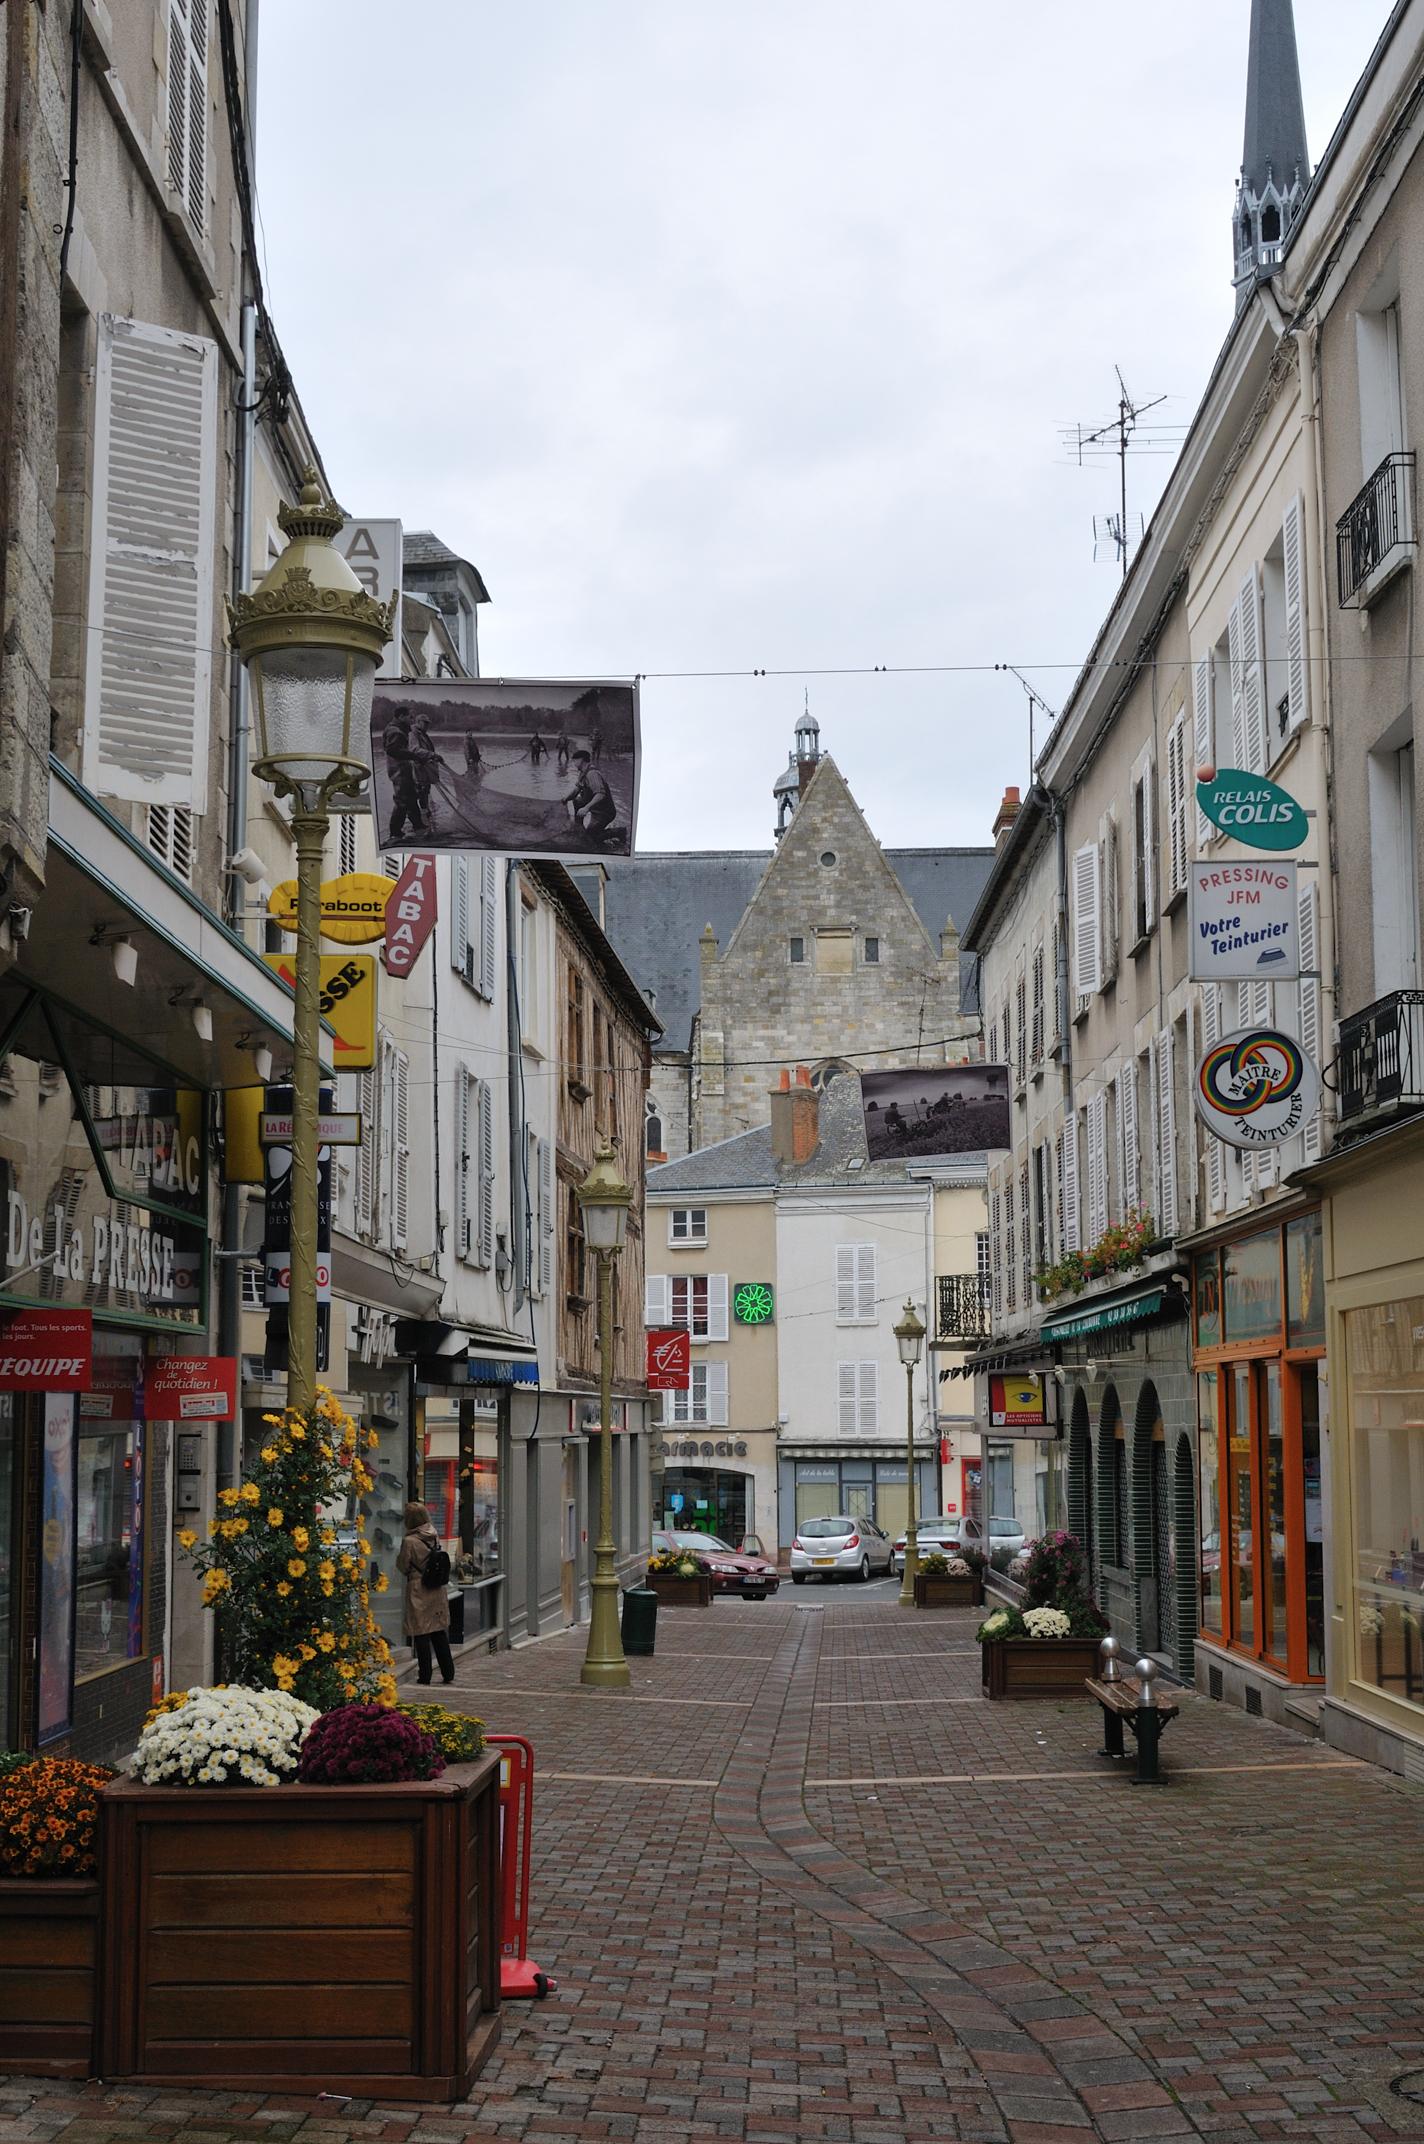 File:Pithiviers rue de la Couronne 1.jpg - Wikimedia Commons